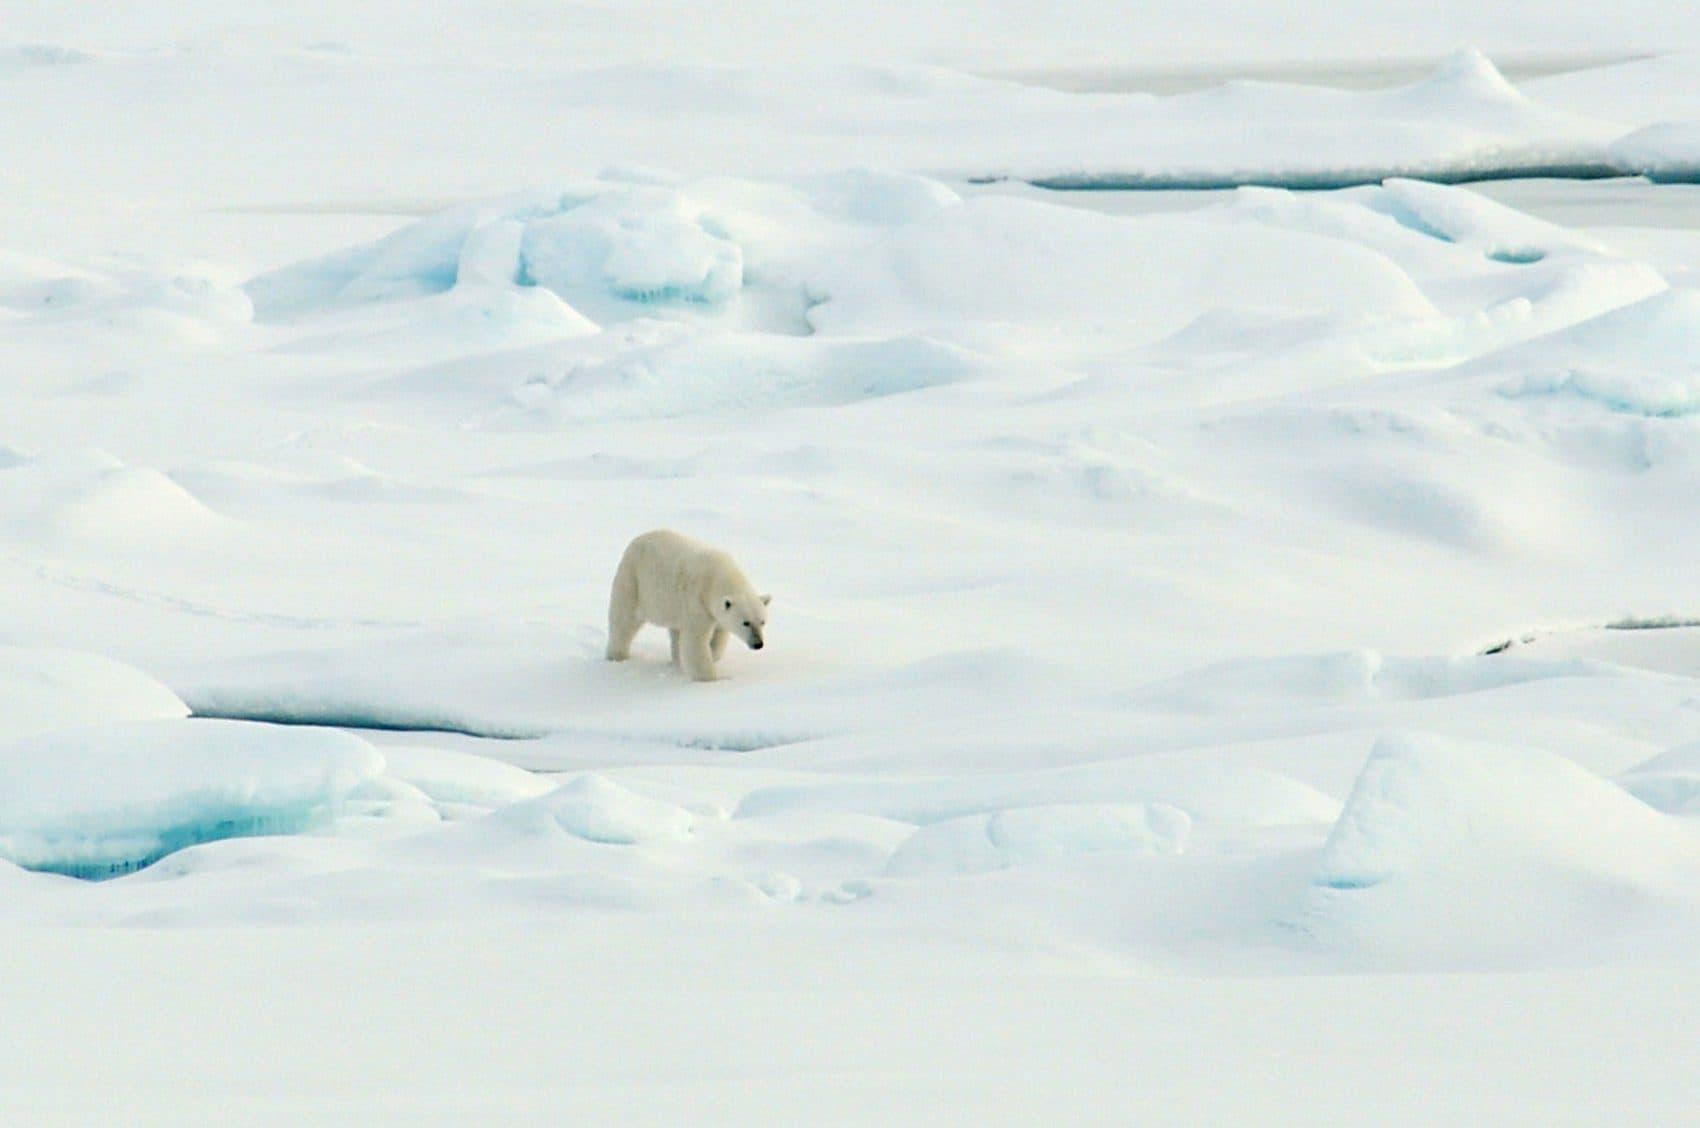 A polar bear walks on the Arctic Ocean ice on Aug. 21, 2009. (Patrick Kelley/U.S. Coast Guard/U.S. Geological Survey via Flickr)